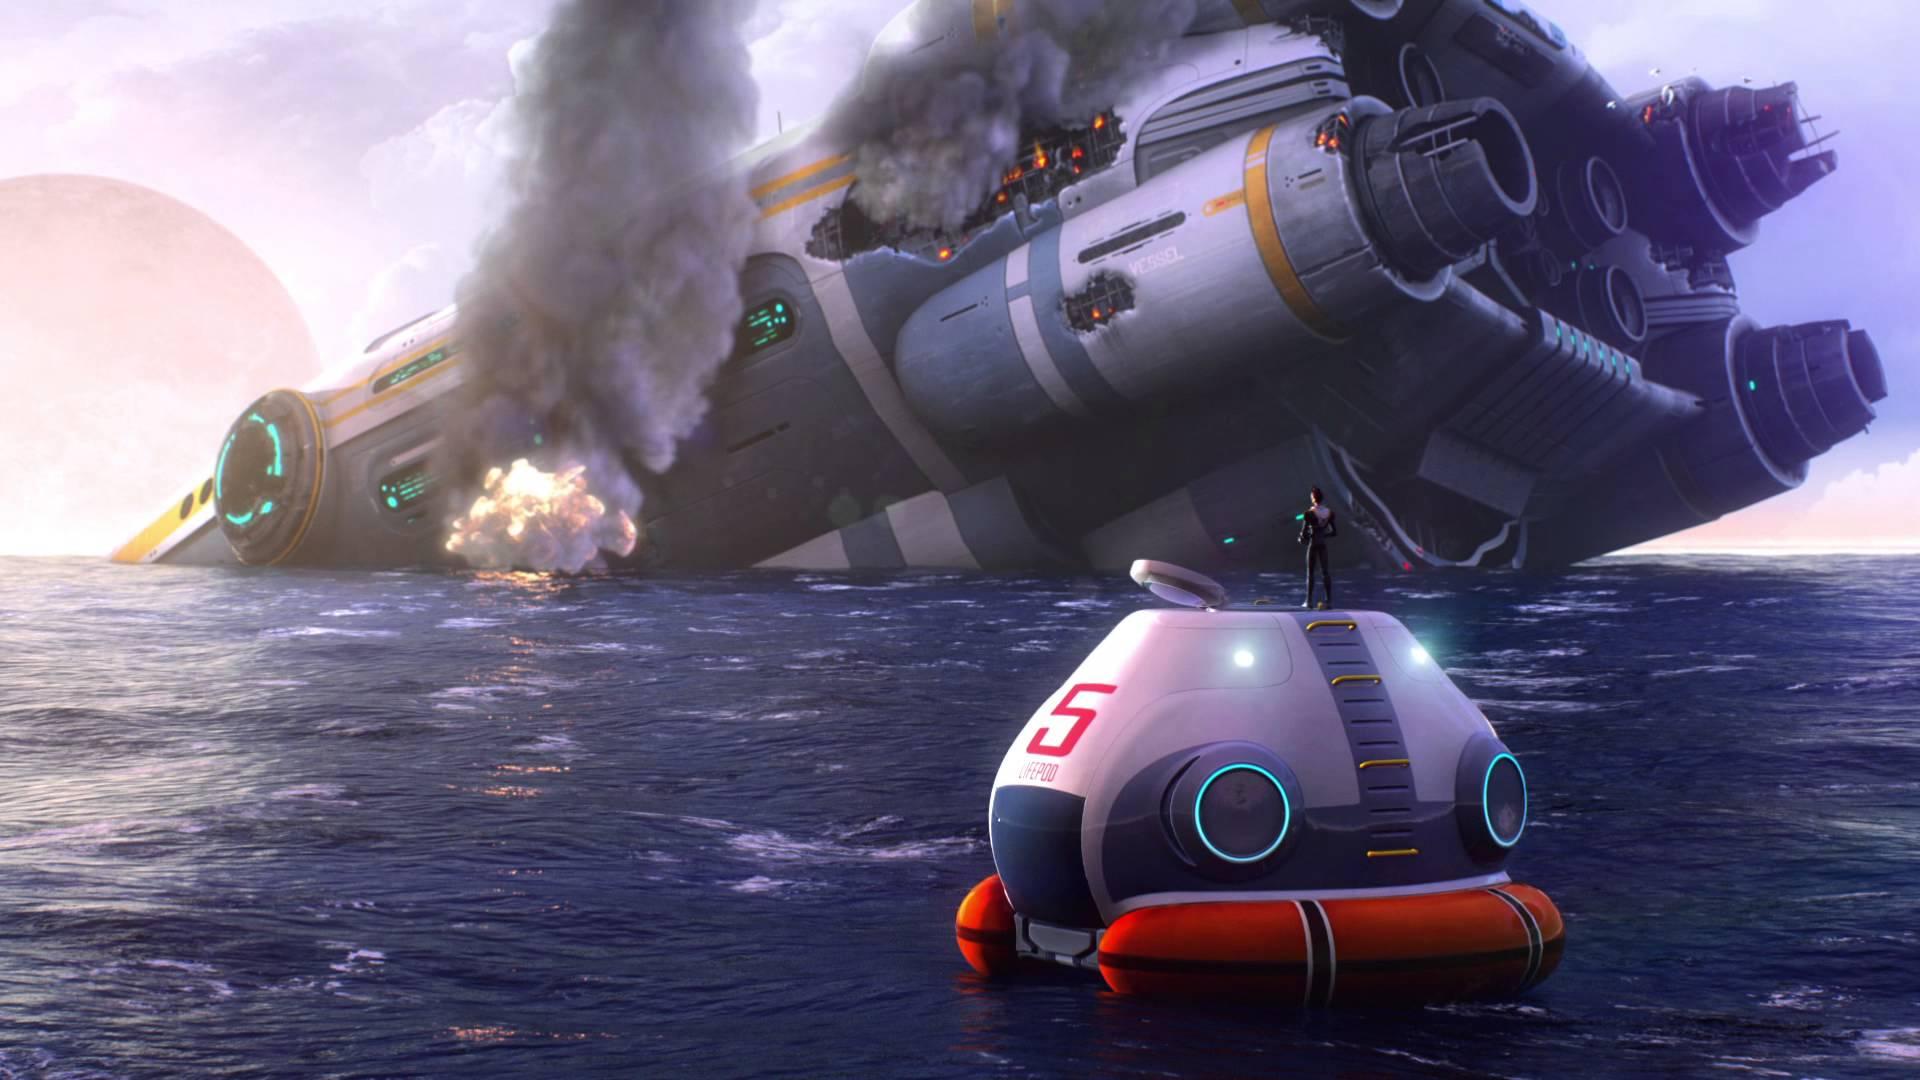 subnautica-full-release-vr-oculus-rift-htc-vive.jpg